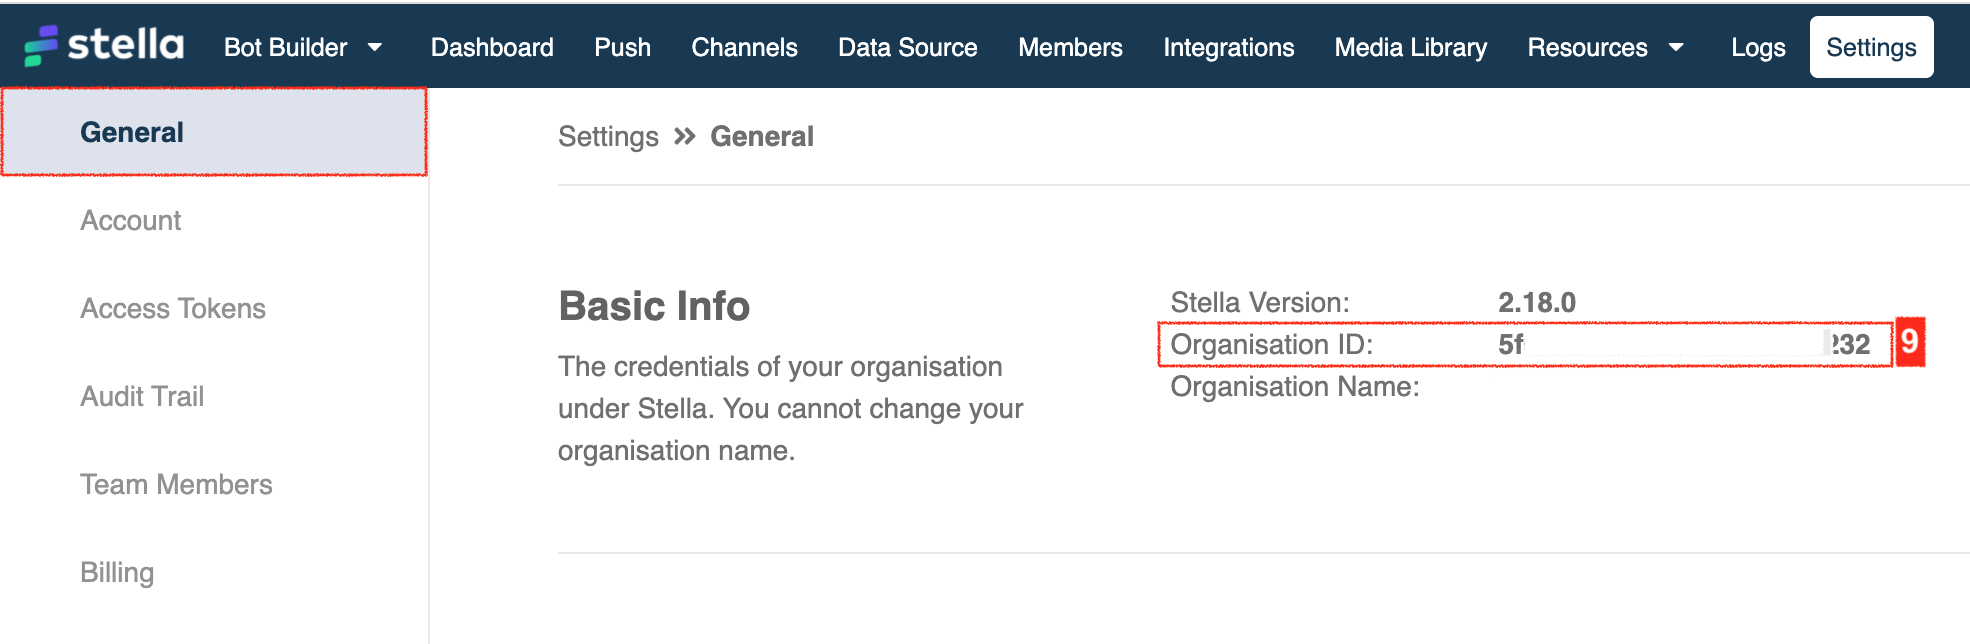 Sanuker Stella - Organisation ID